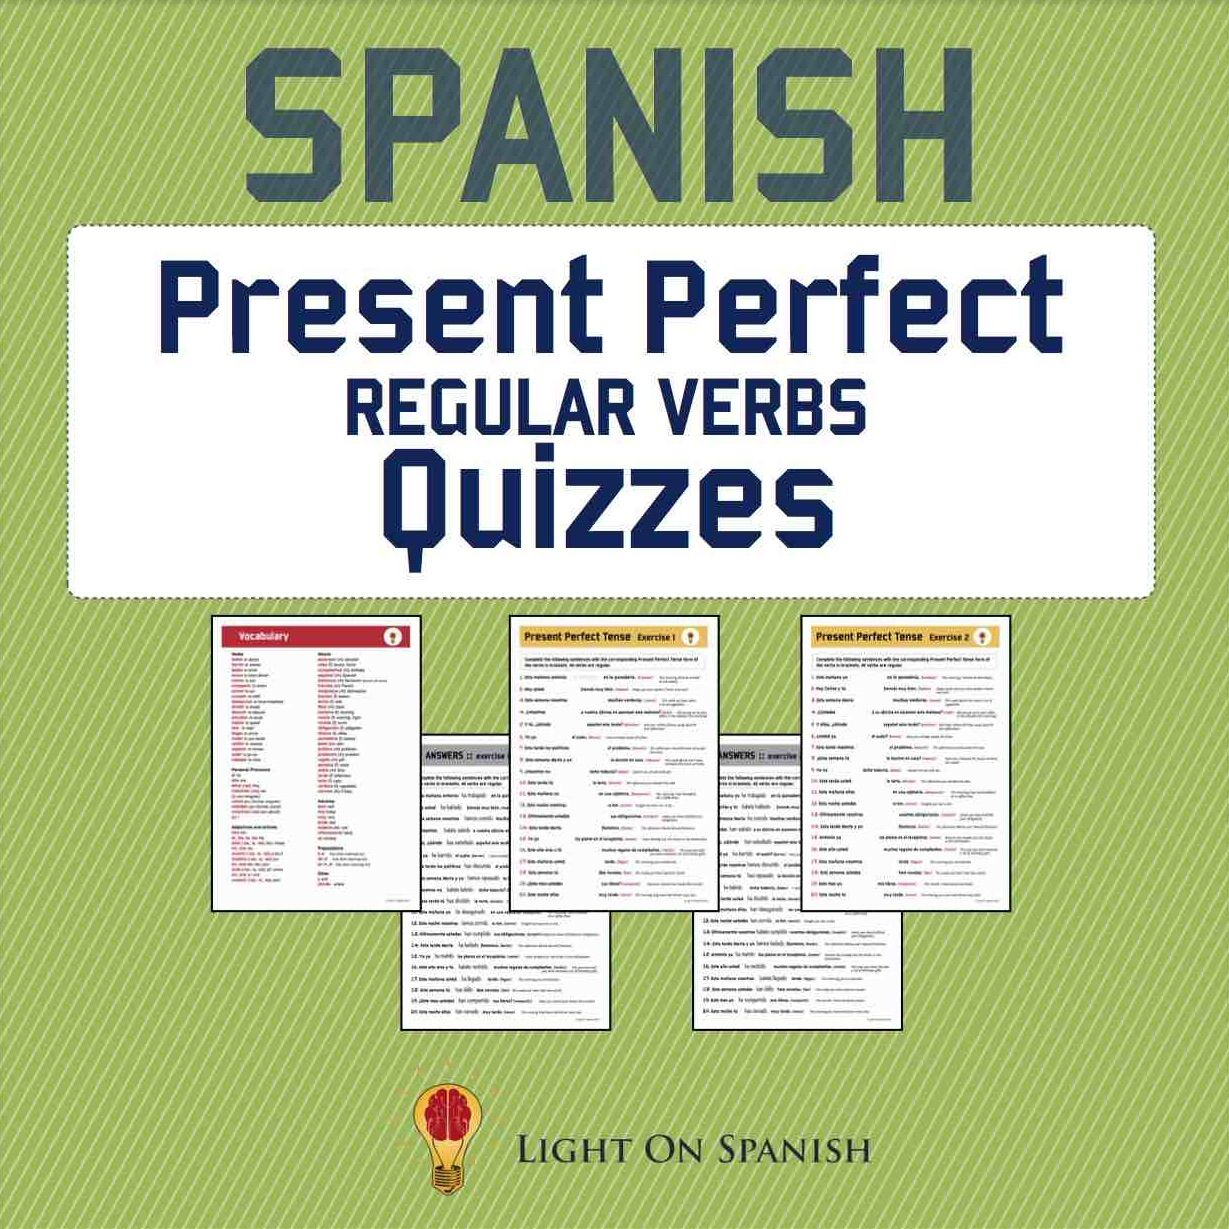 Spanish Present Perfect Regular Verbs Quizzes 3 Regular Verbs Present Perfect Verb [ 1229 x 1229 Pixel ]